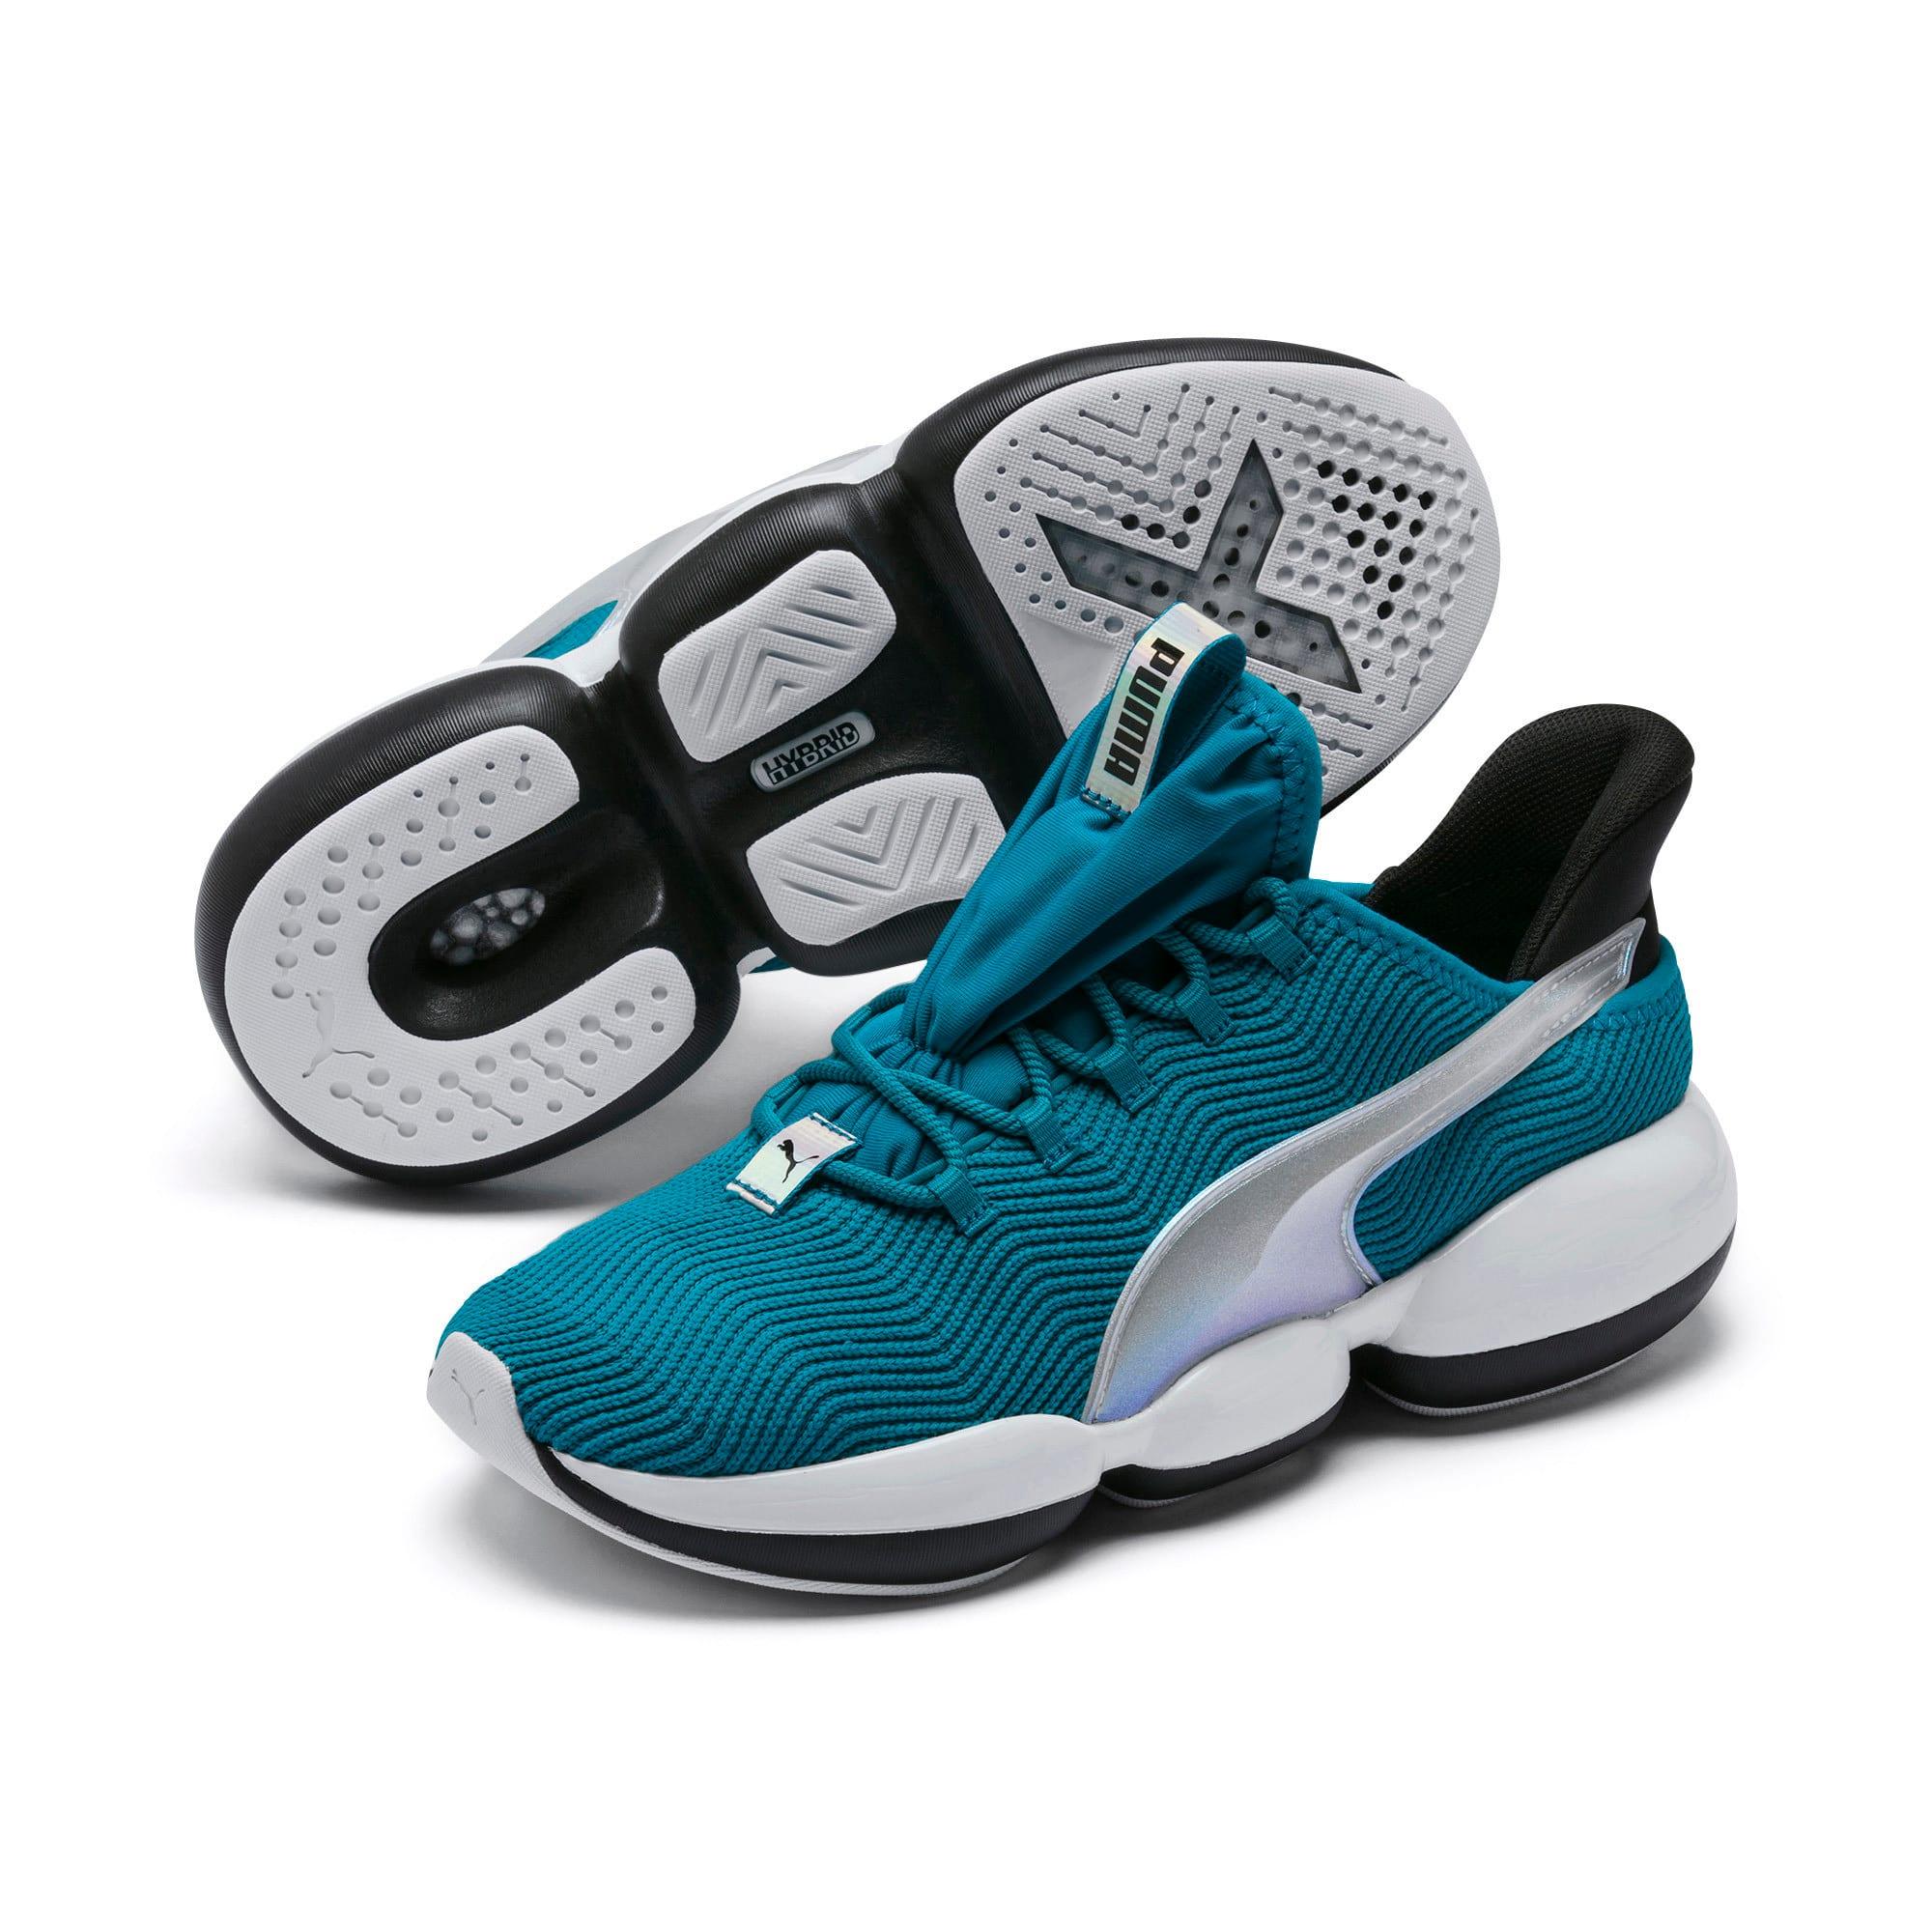 Thumbnail 3 of Mode XT Trailblazer Iridescent Women's Training Shoes, Caribbean Sea-Puma White, medium